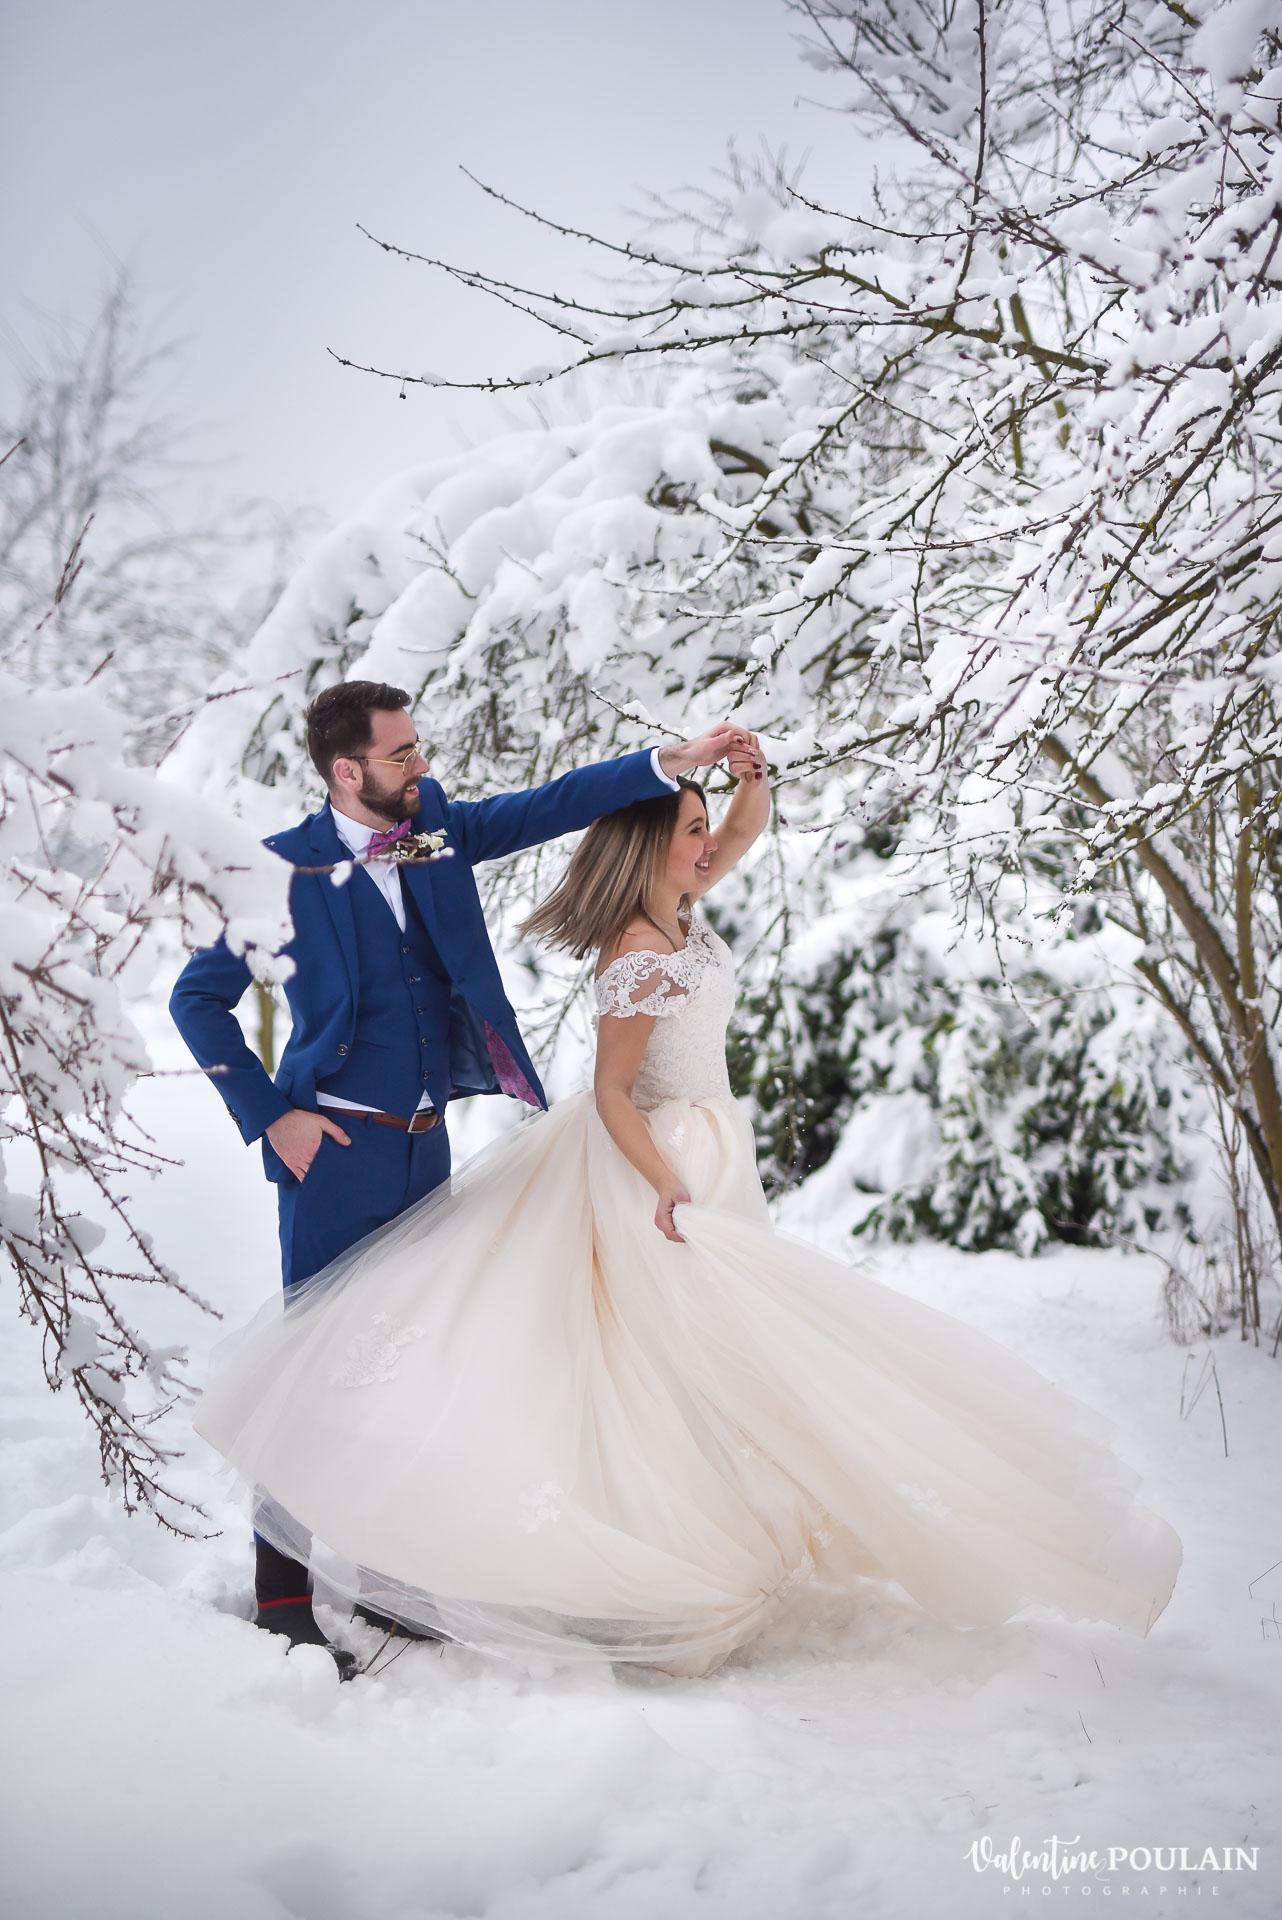 Photo mariage neige hiver - Valentine Poulain tourne